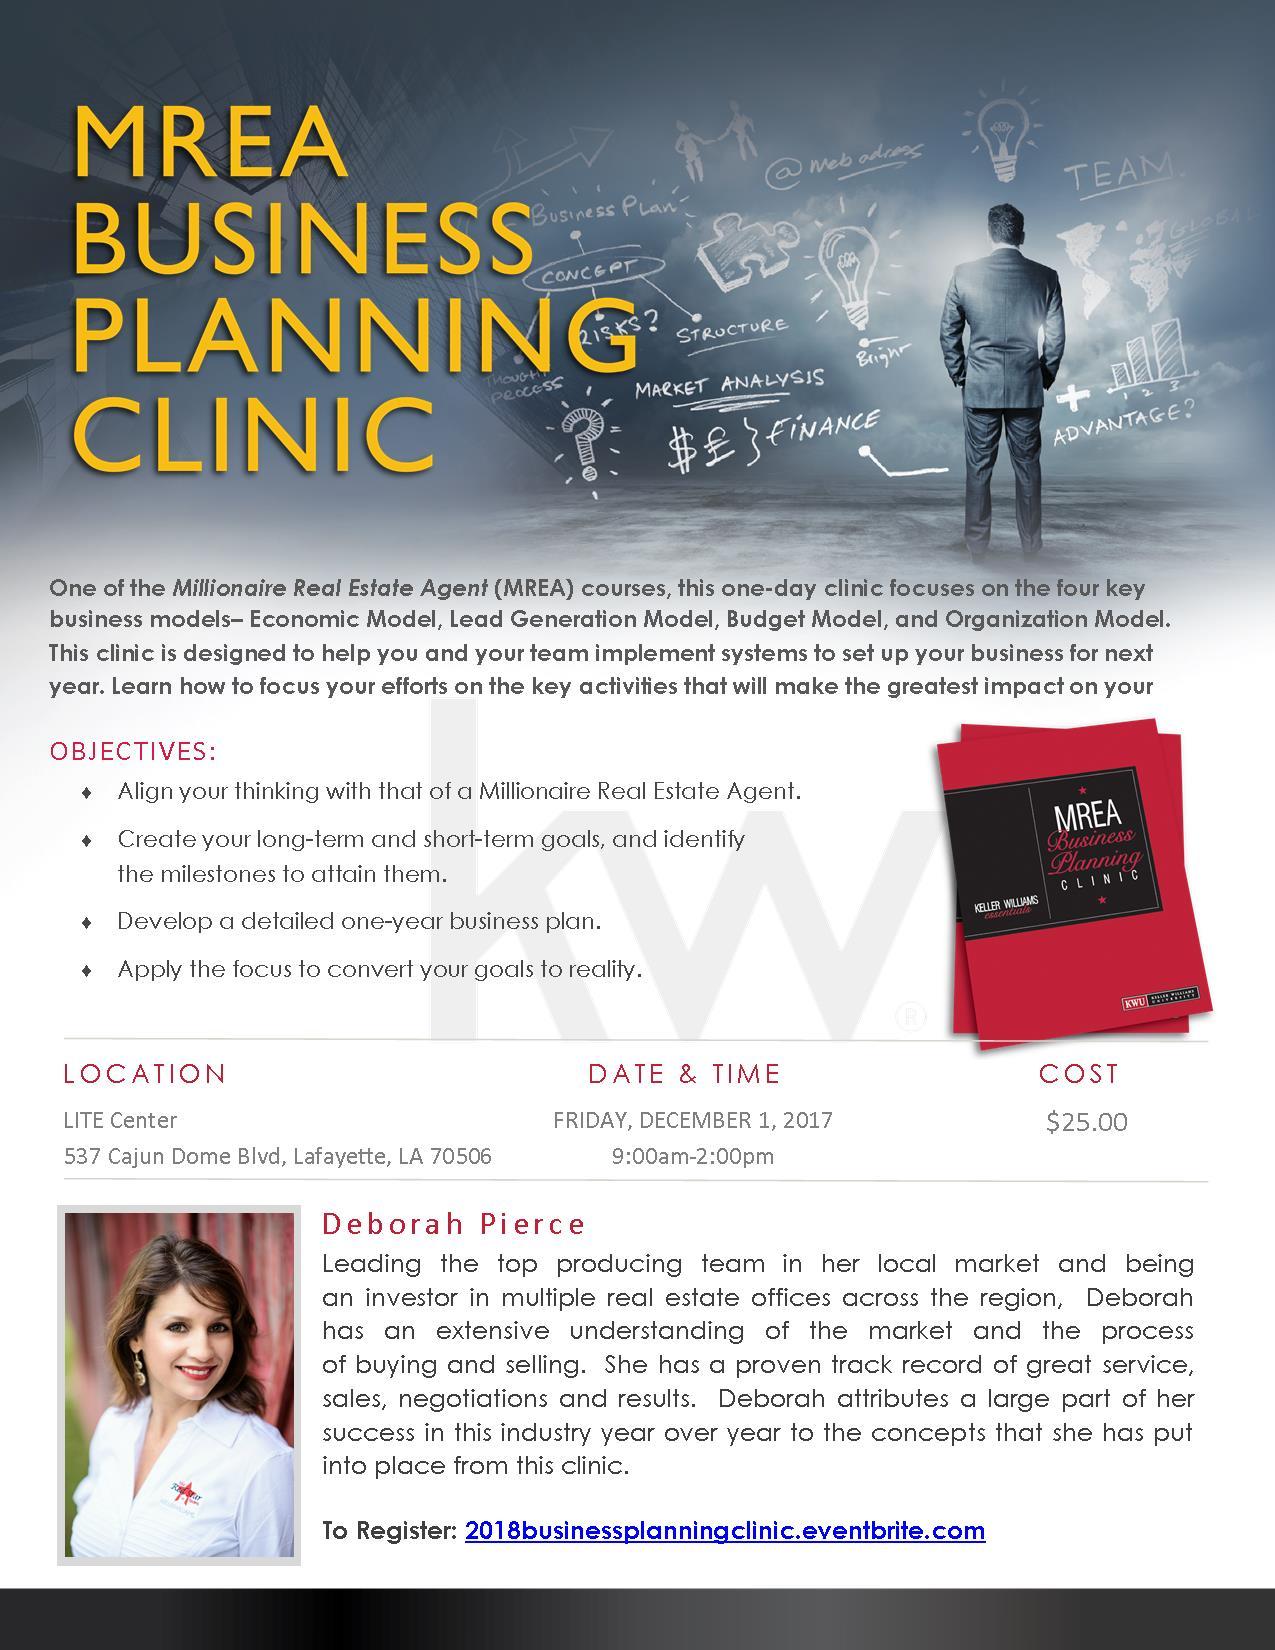 2018 MREA Business Planning Clinic